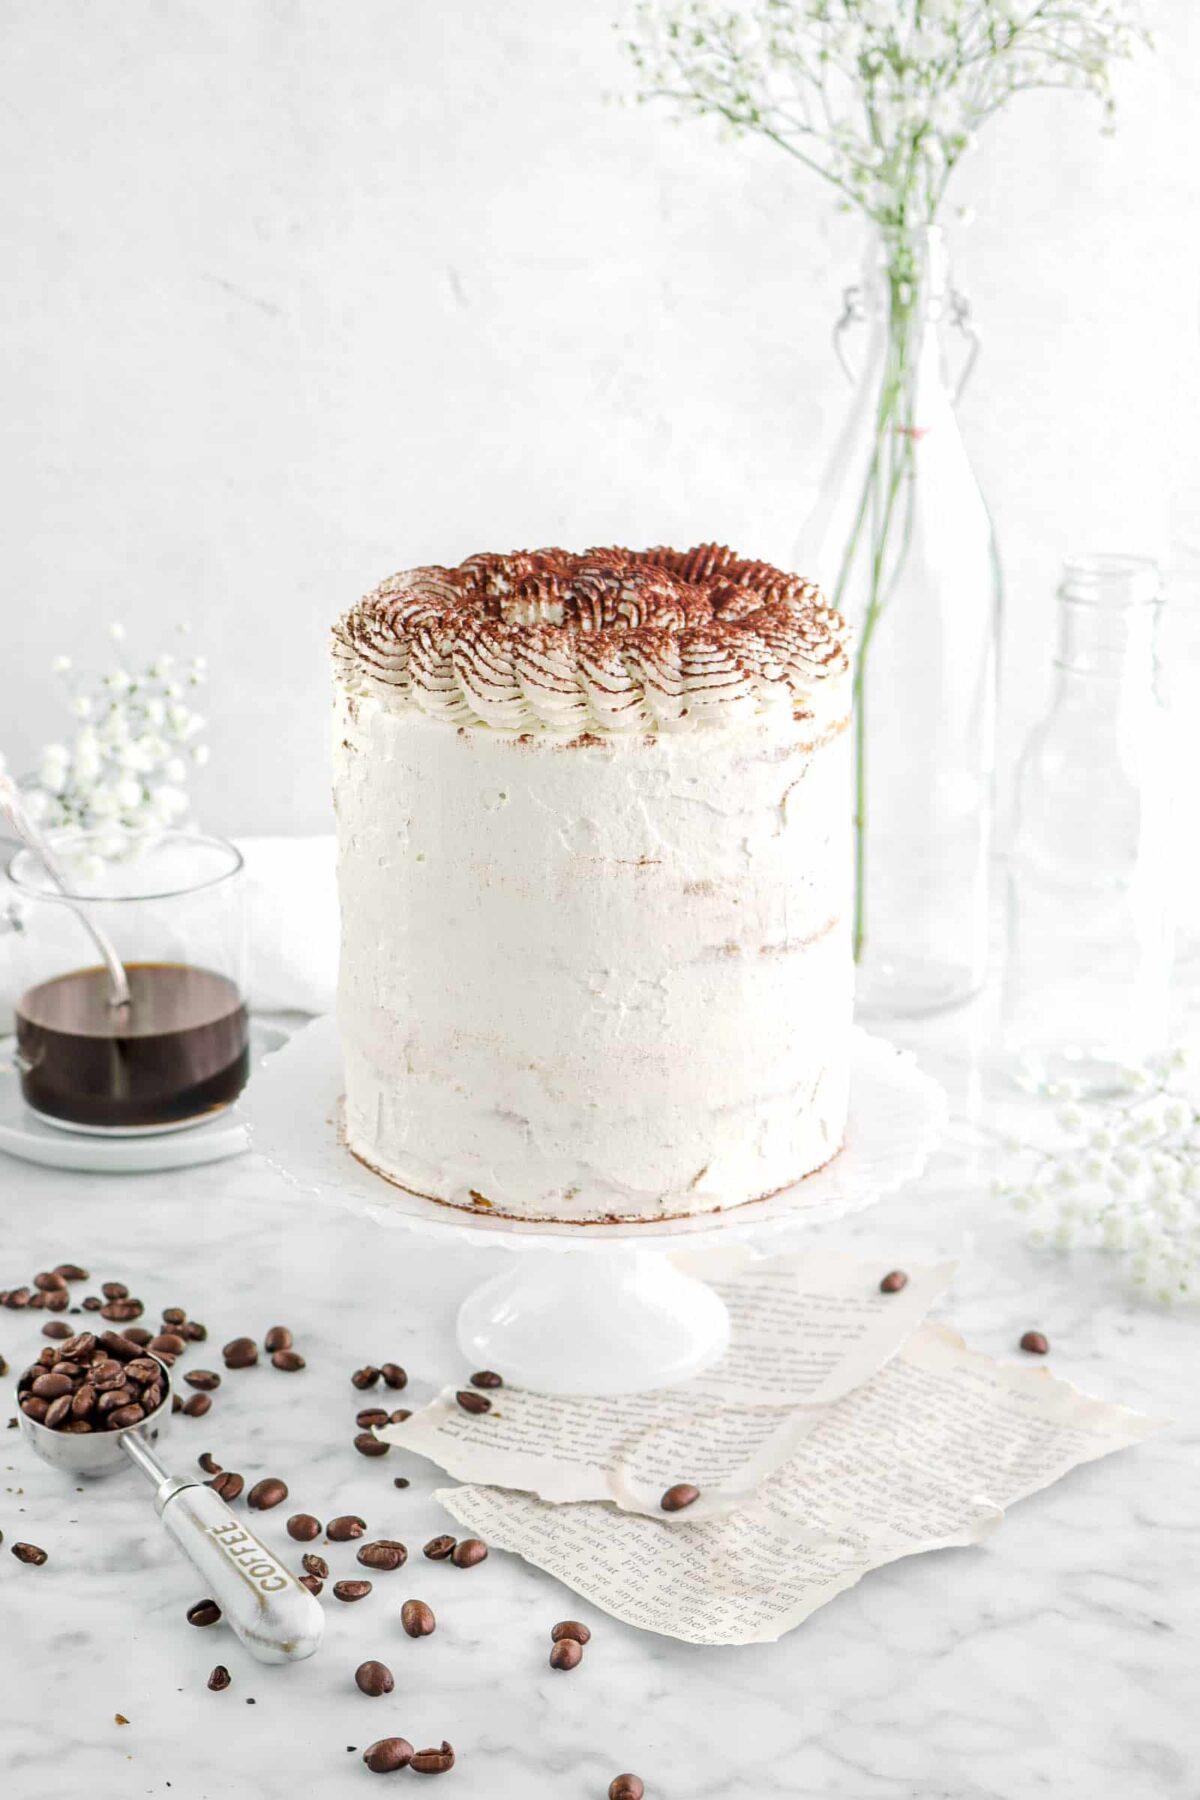 Tiramisu cake with flowers around, coffee beans, and a cup of coffee